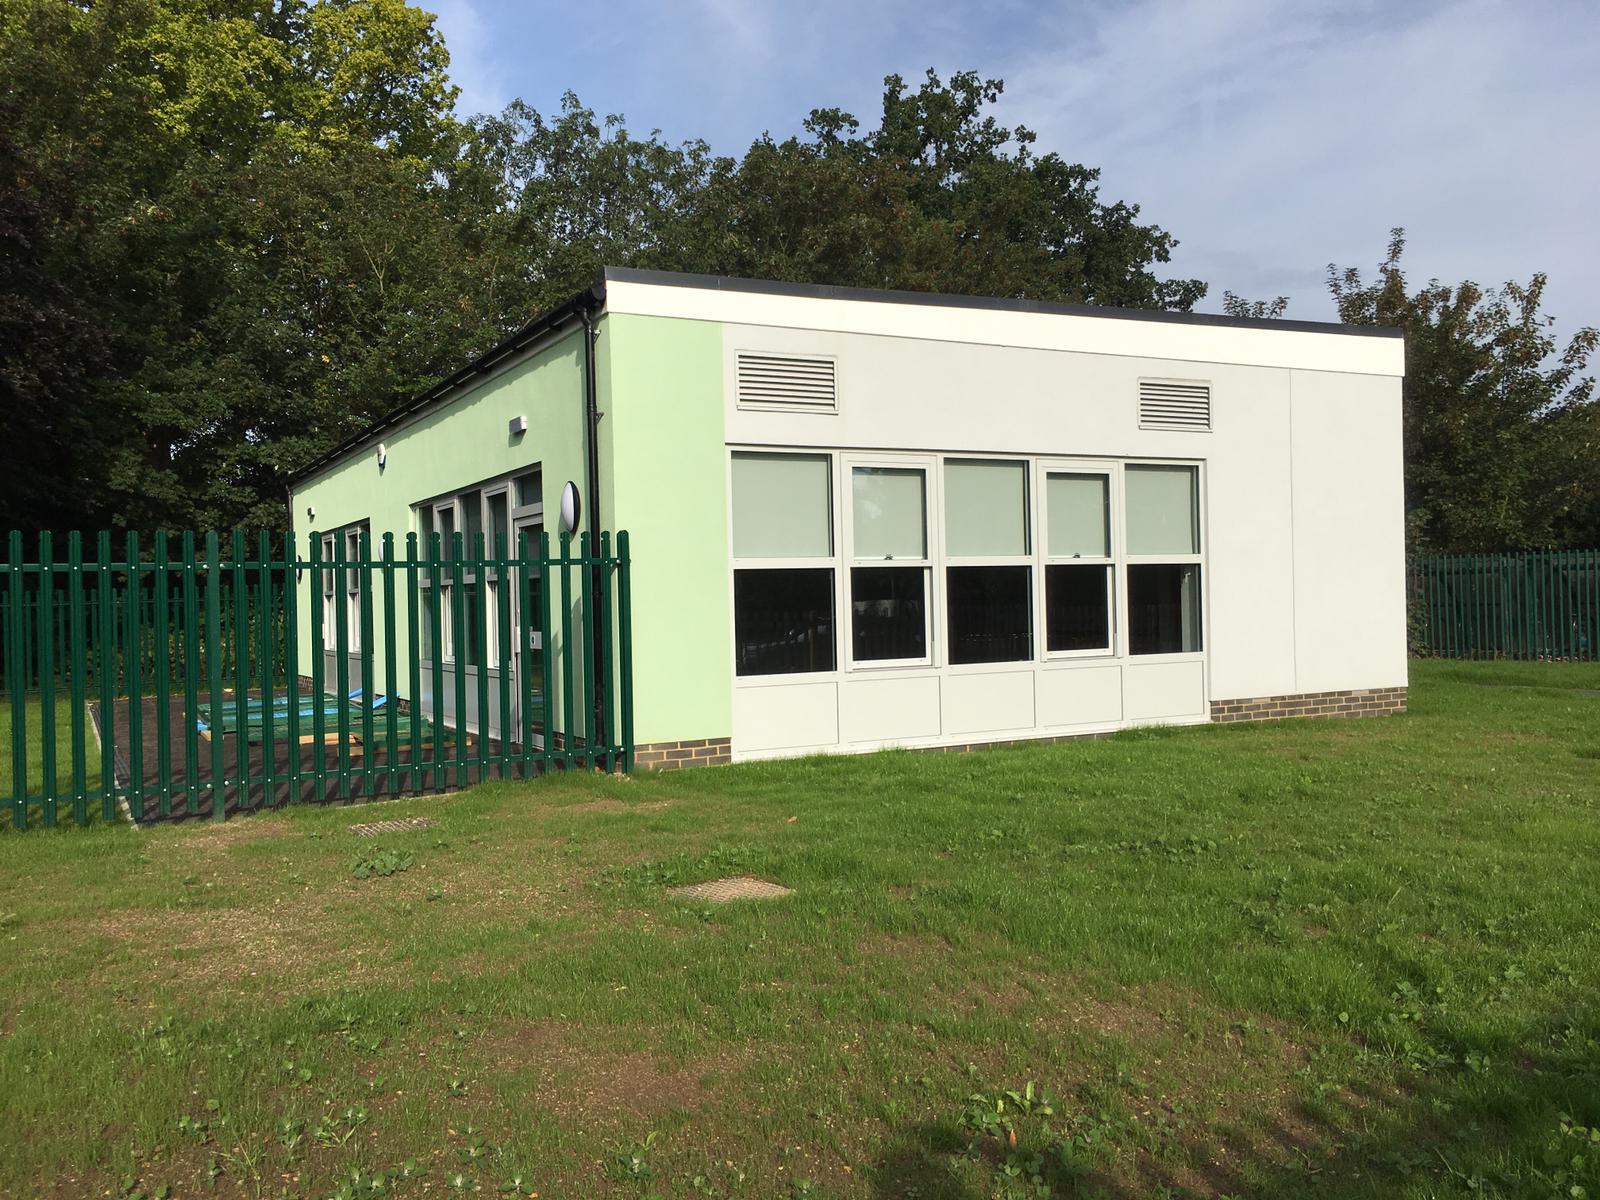 BMAT trust aims for zero permanent exclusion for Essex schoolchildren